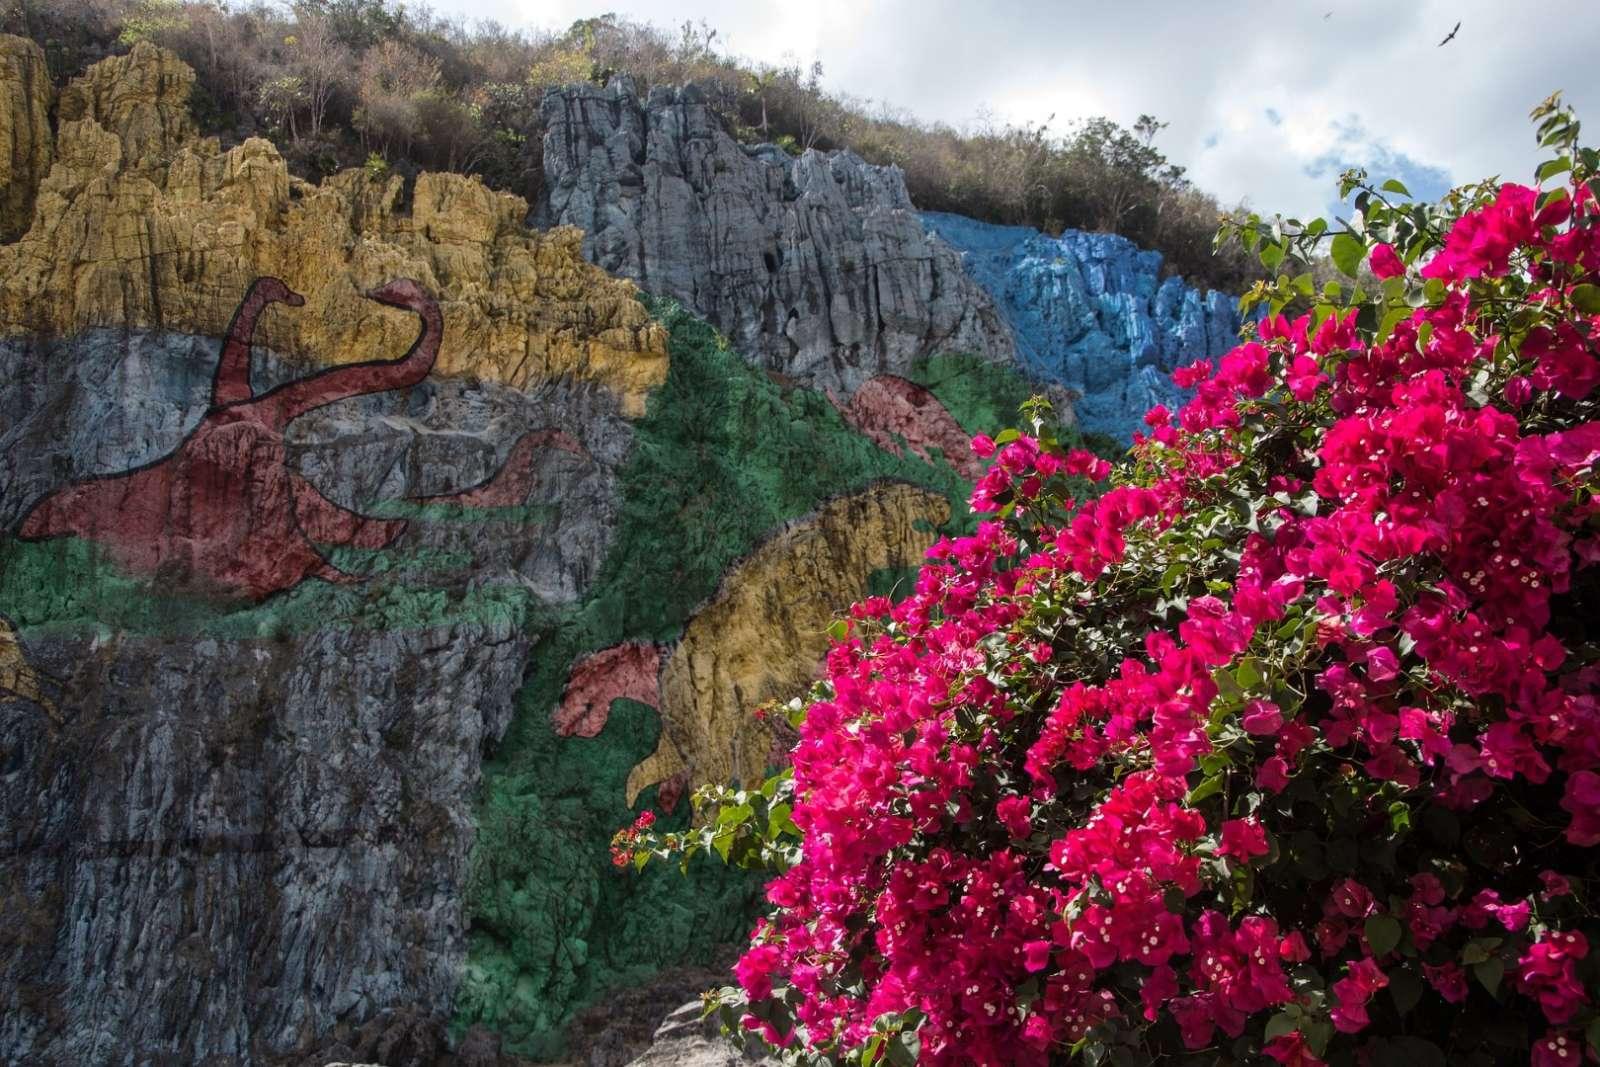 Mural of Pre-History in Vinales, Cuba